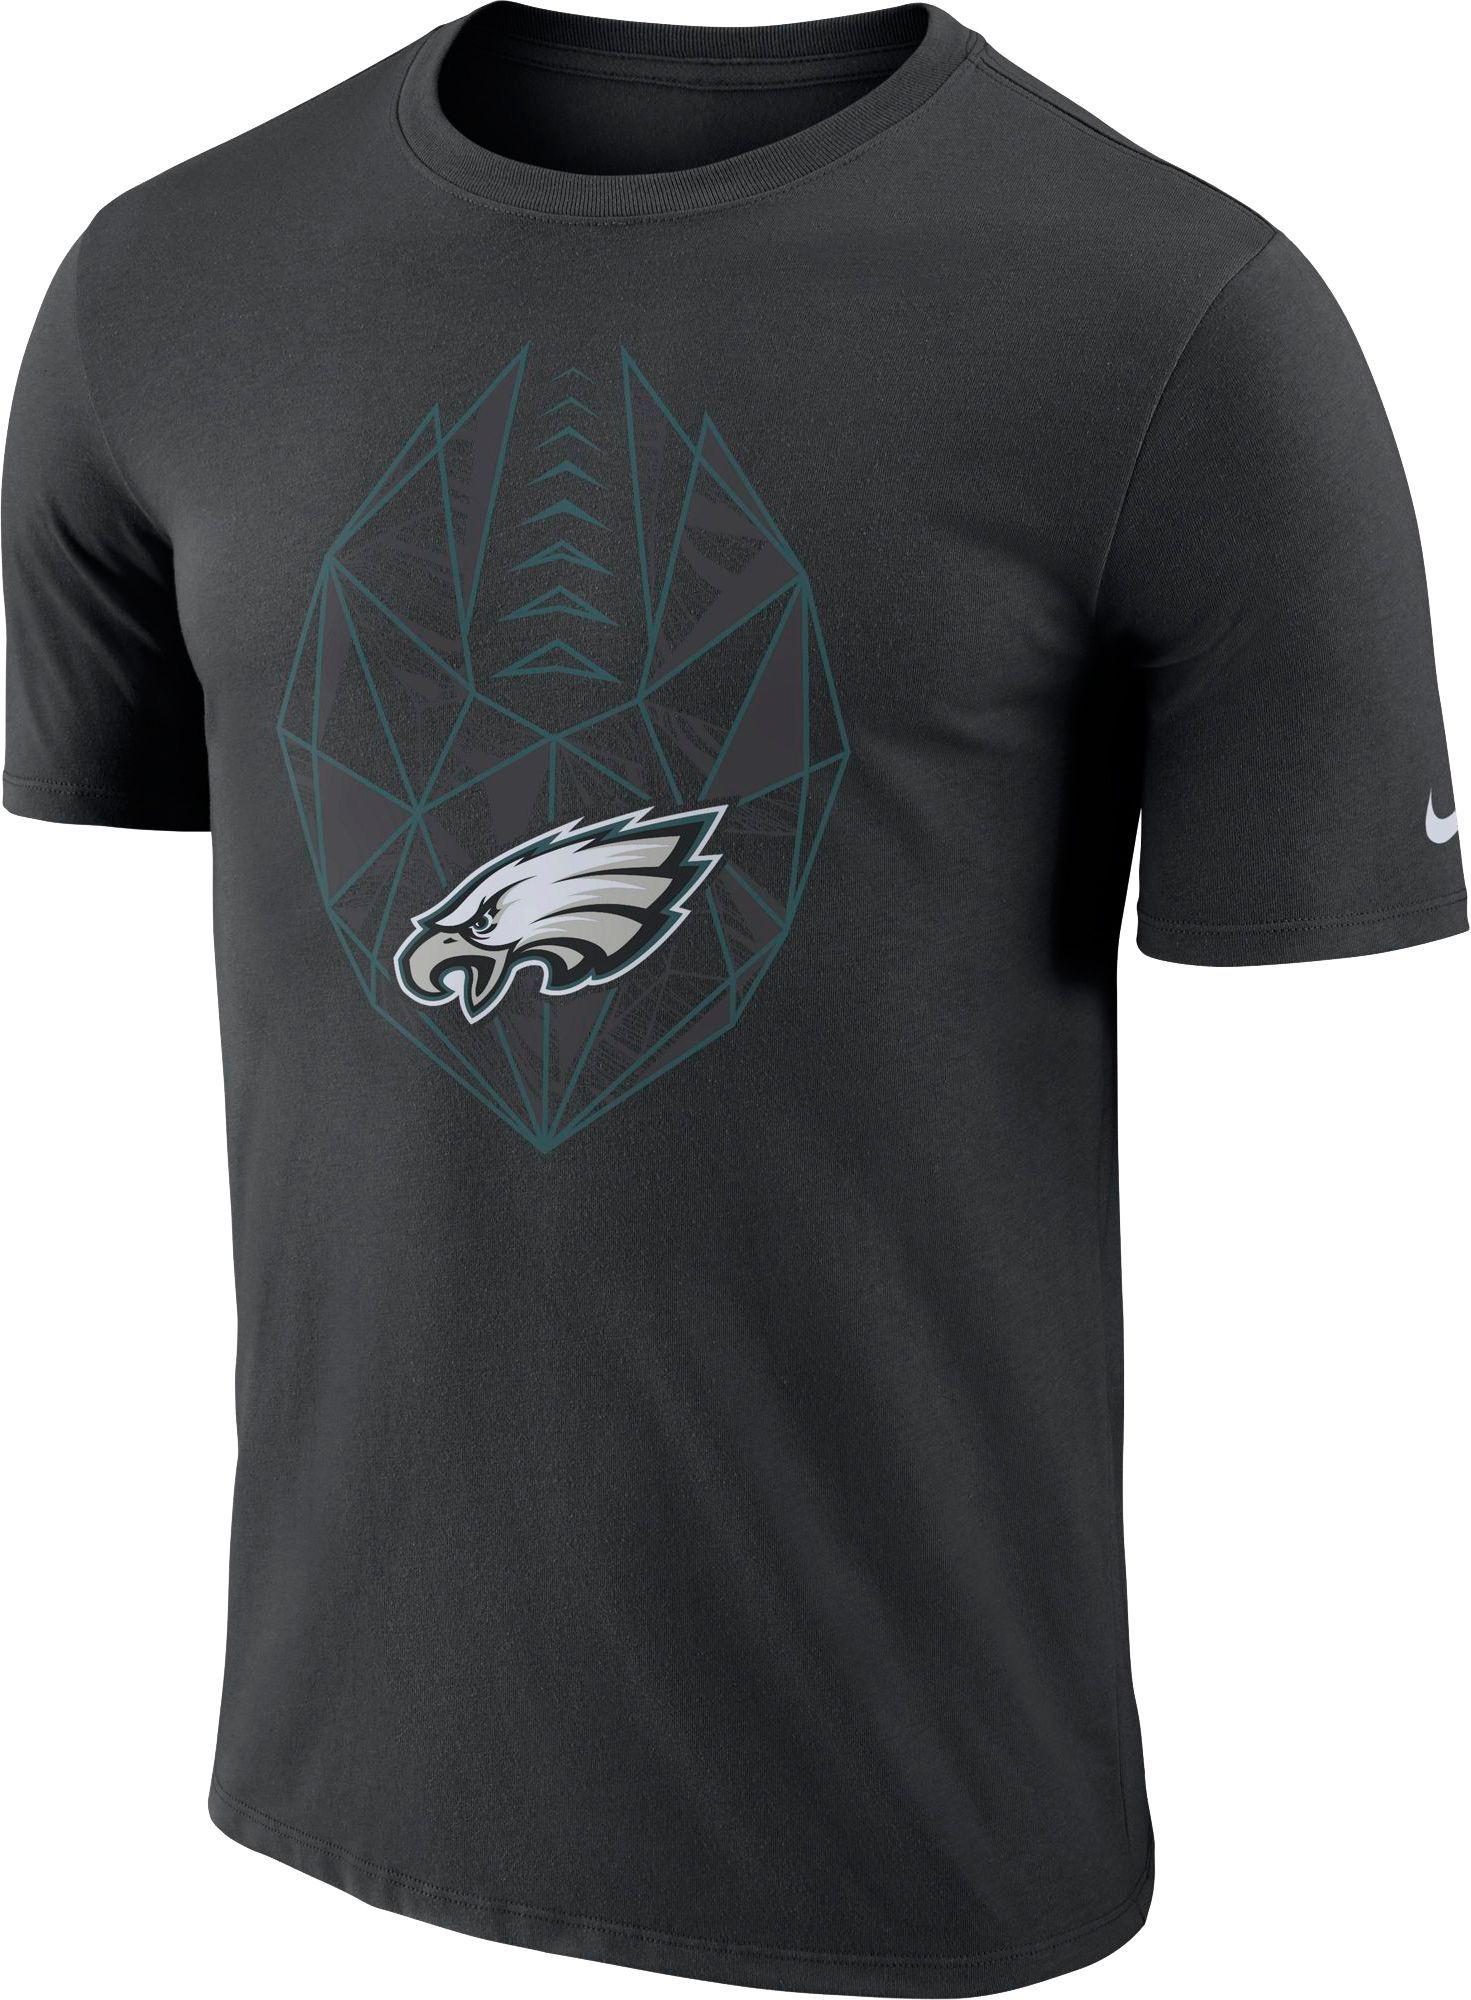 d544180e Nike Men's Philadelphia Icon Performance Black T-Shirt   Products in ...